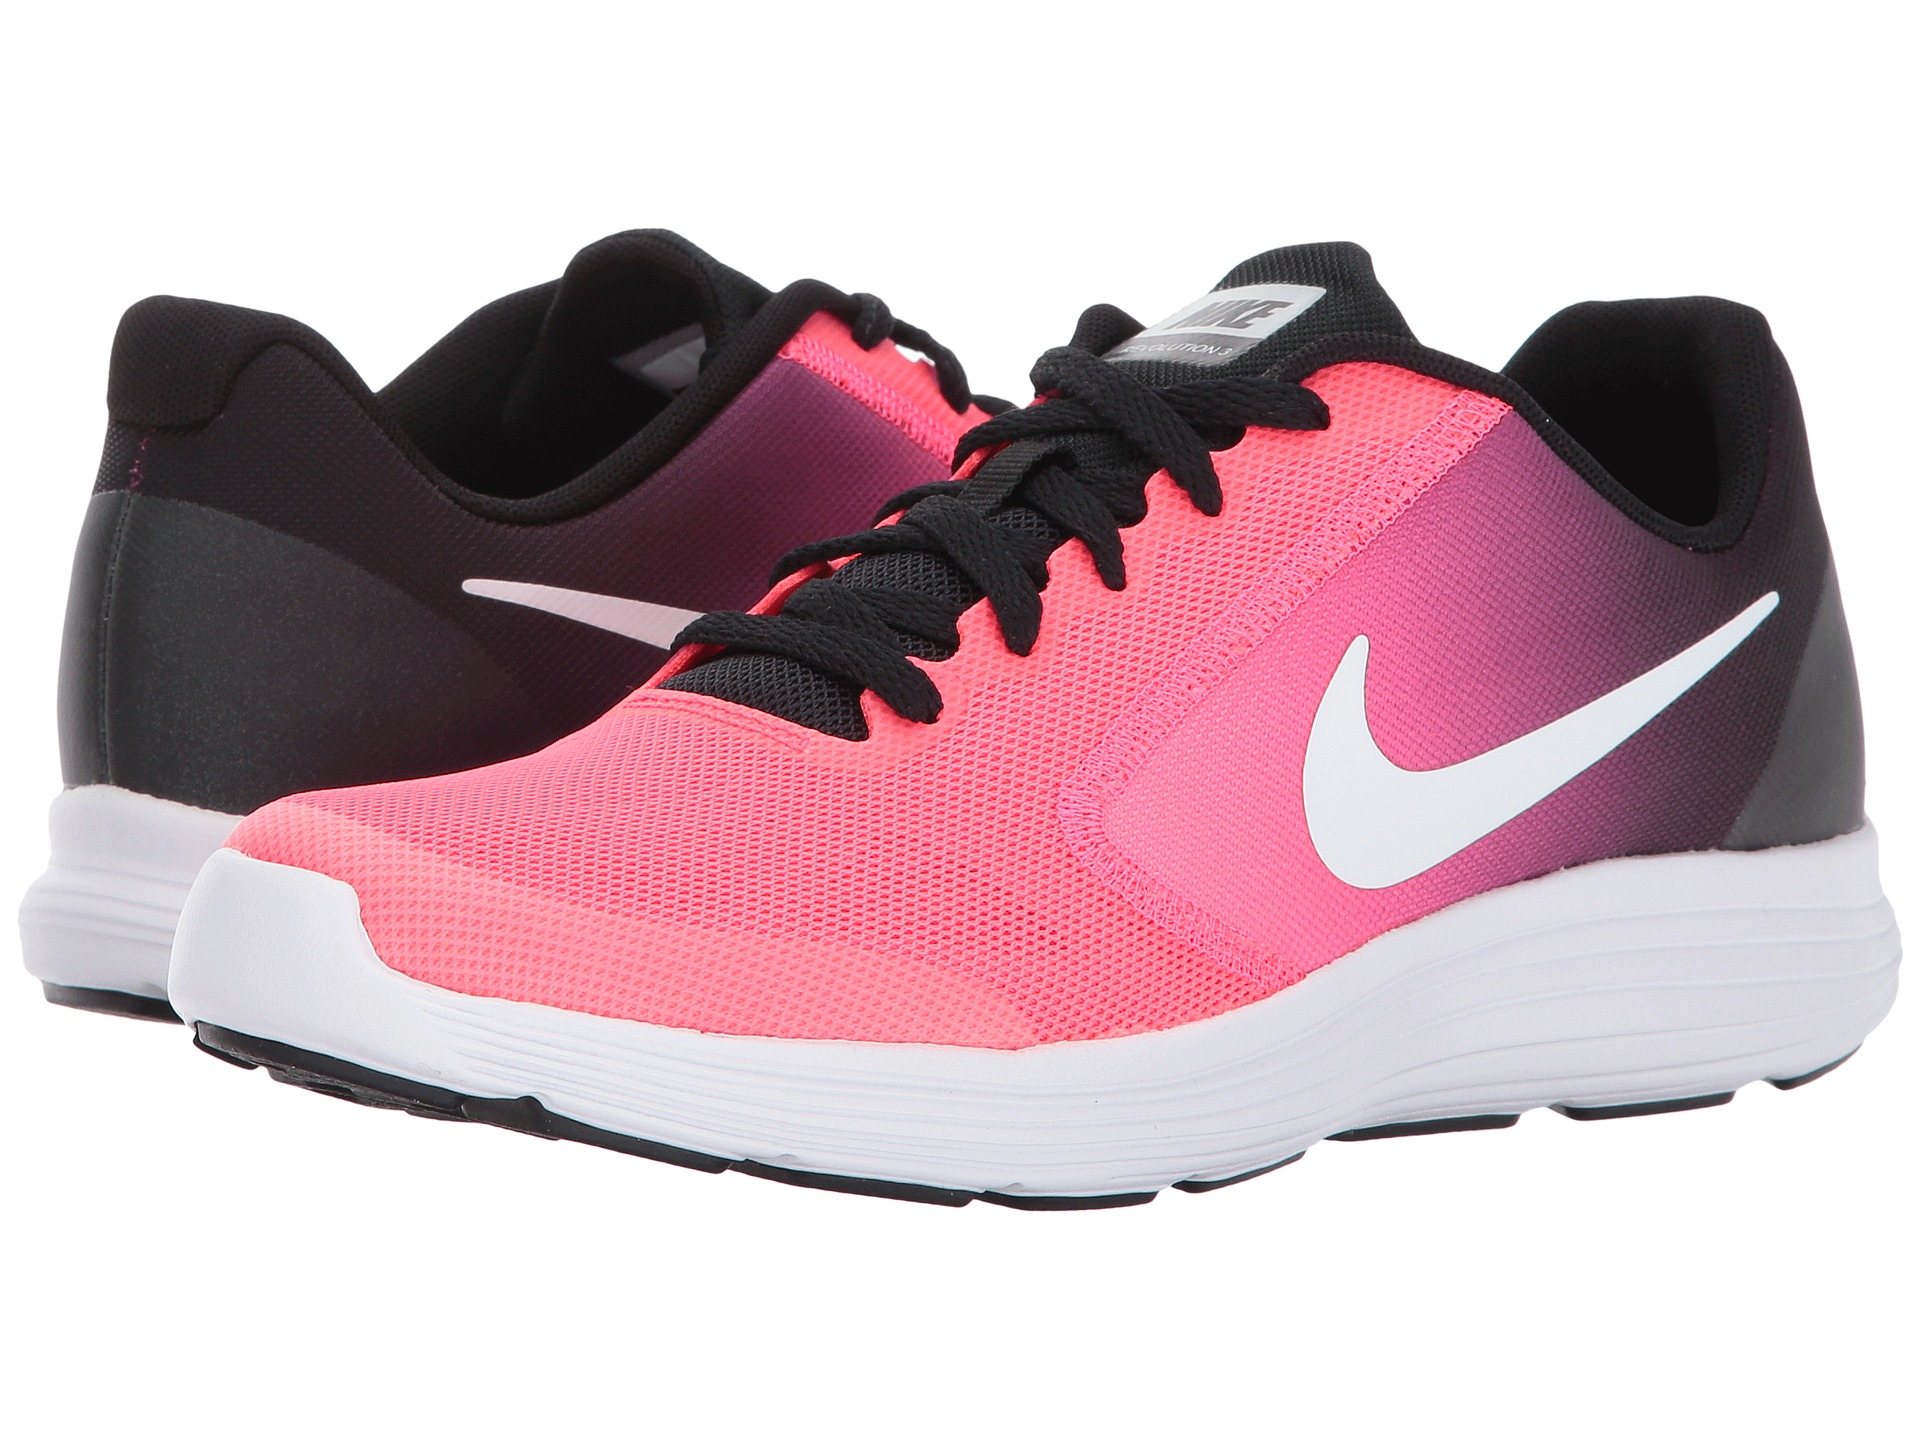 Girls Nike Big Kids Running Shoes Size